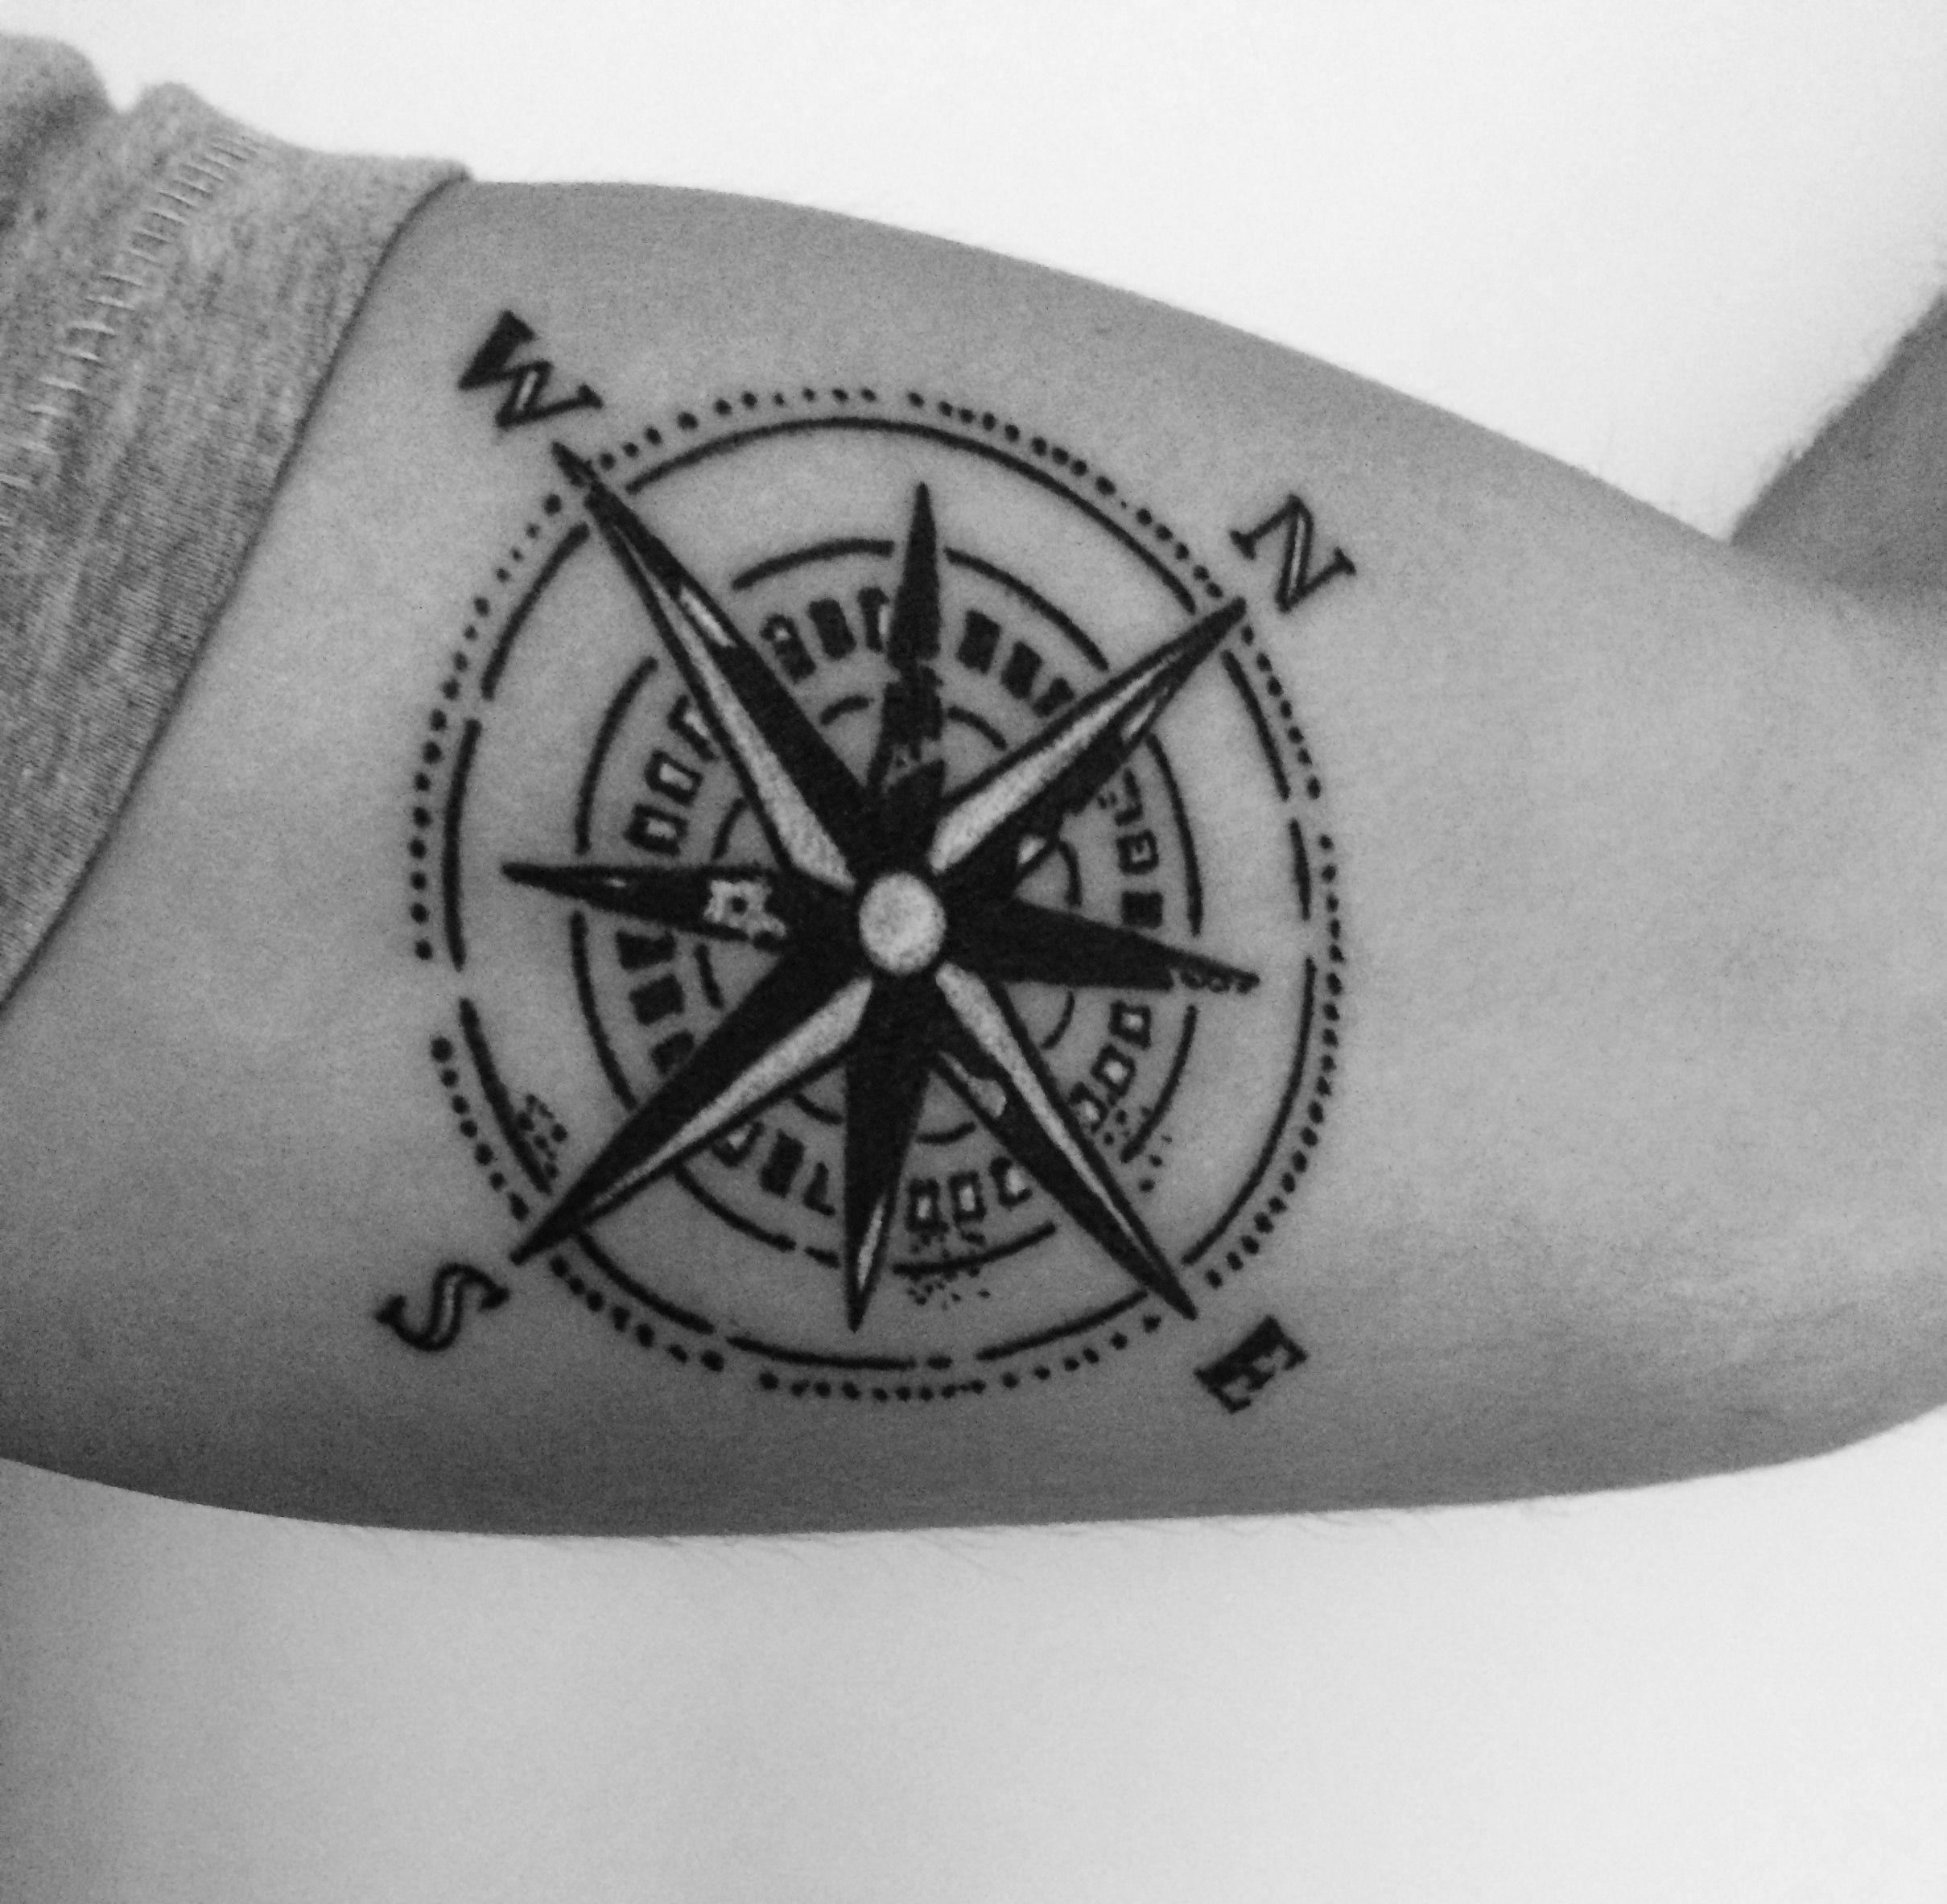 Always Find The Right Path Tattoo Ideas Tattoos